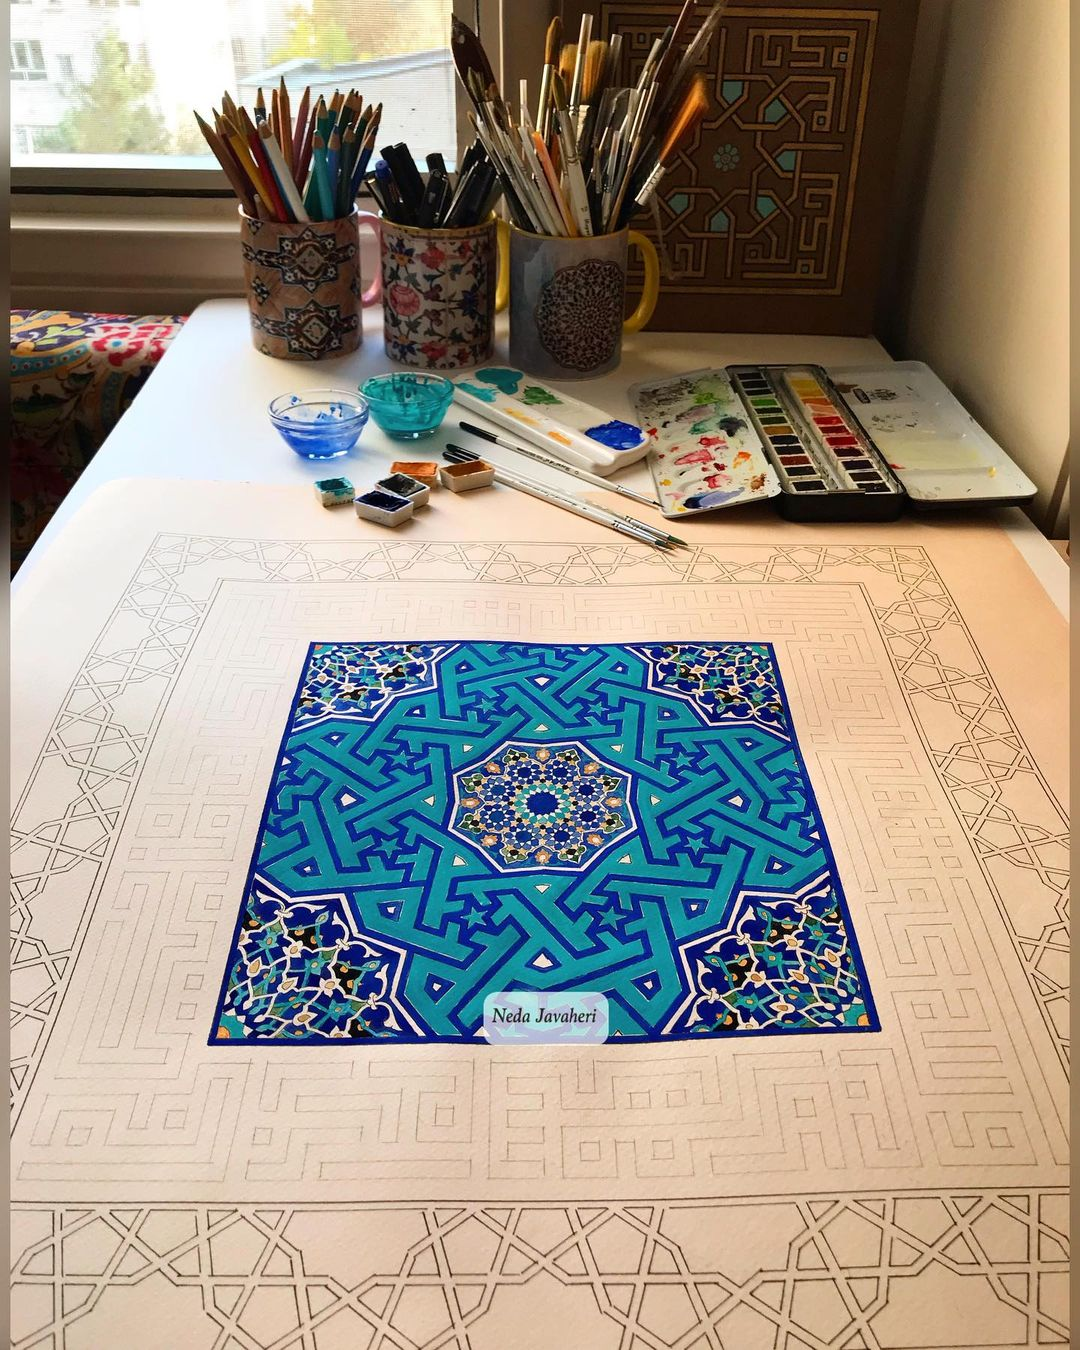 Karya Kaligrafi  ای در دل من میل و تمنا همه تو واندر سر من مایهٔ سودا همه تو هر چند  به روی کار …- Ne Javaher